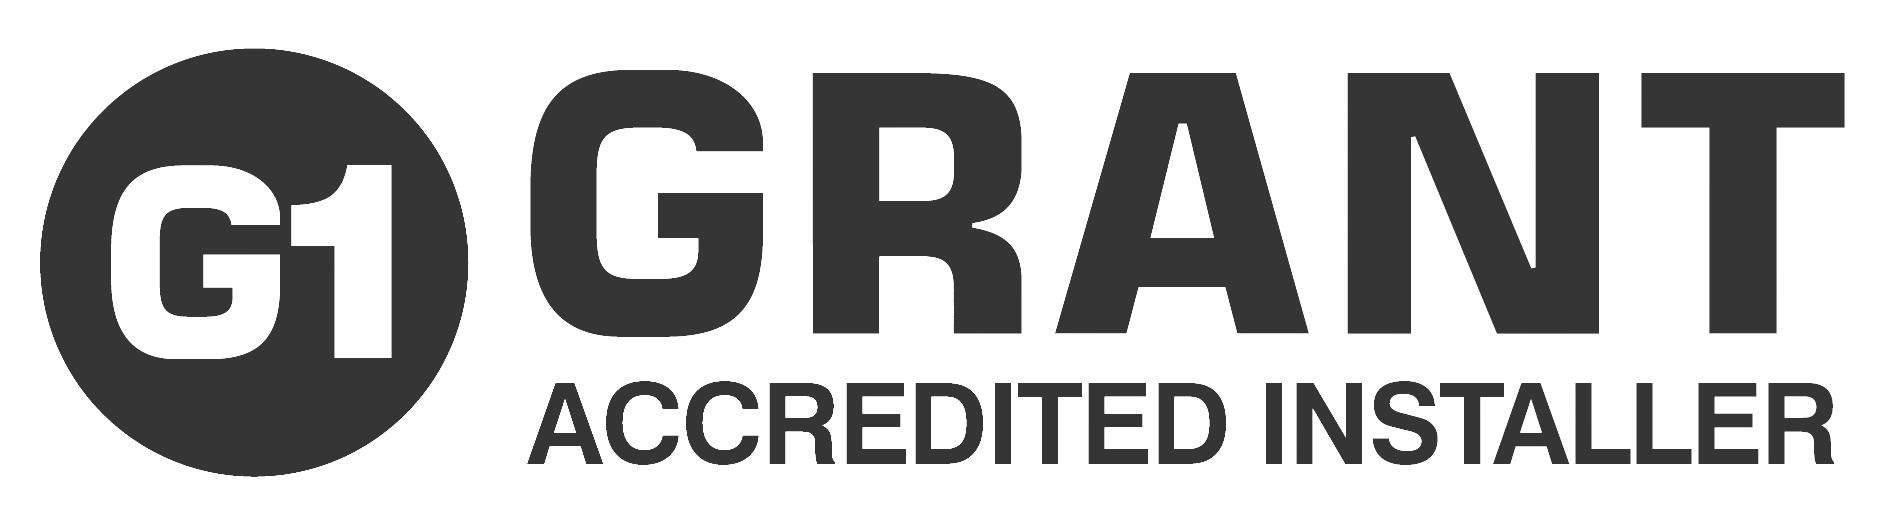 G! Grant Accredited Installer